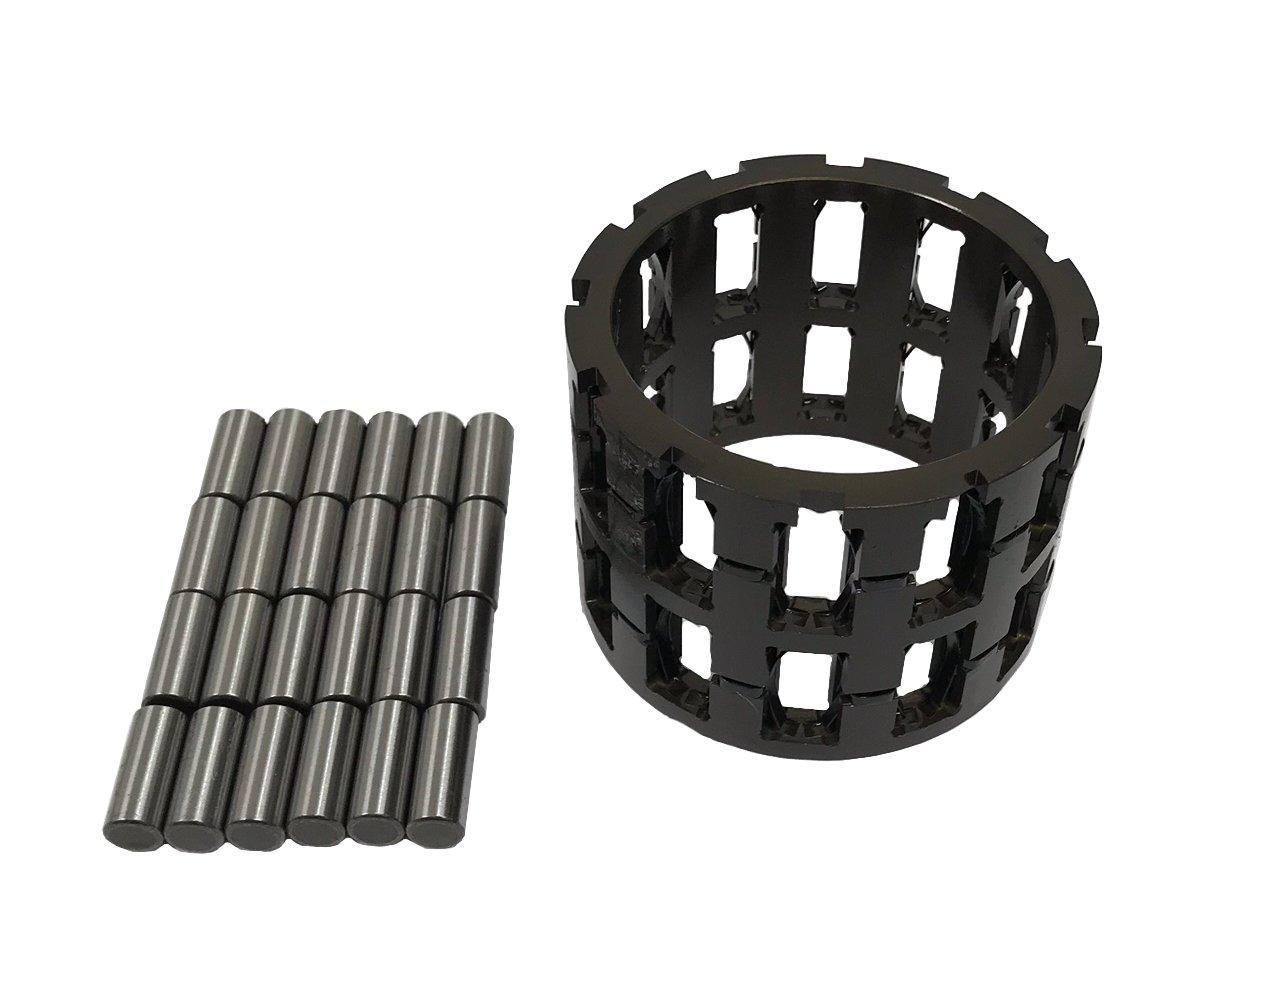 Polaris RZR 1000 Front Differential Roll Cage Sprague & roller kit 3235487